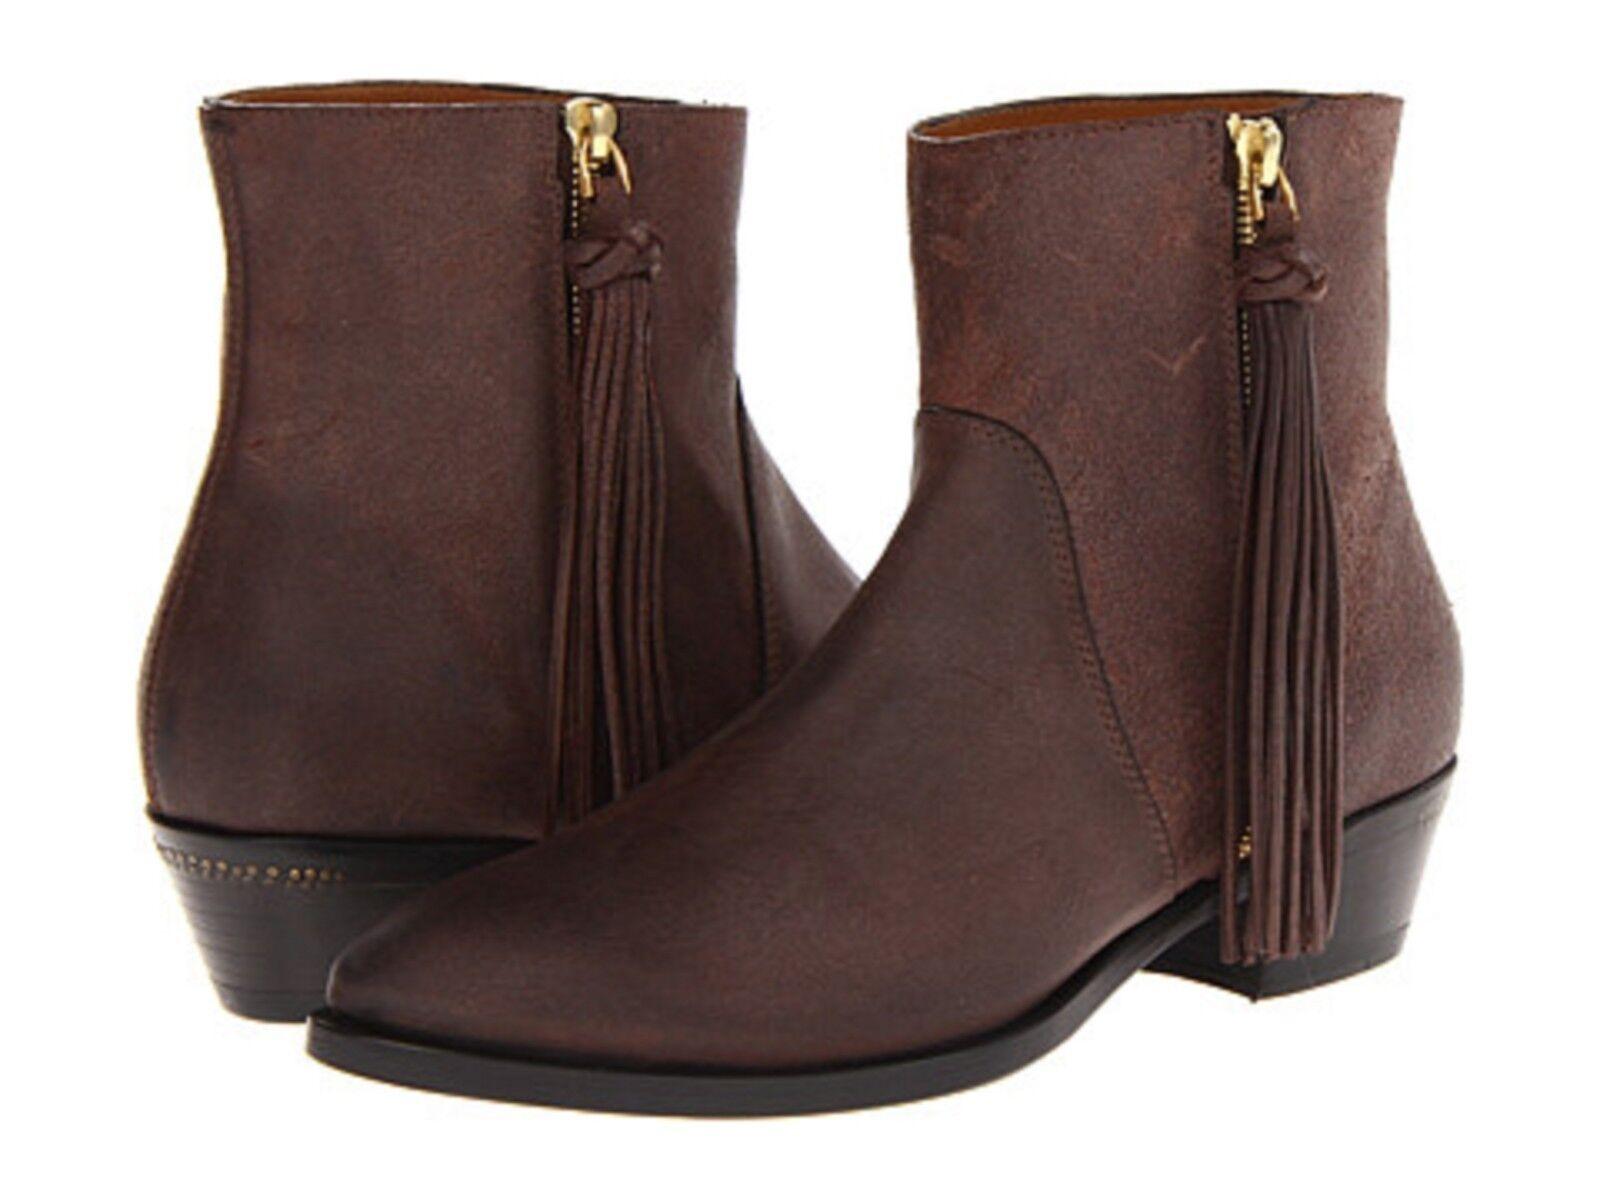 795 NEW RALPH LAUREN COLLECTION US 7.5 braun Suede Ninette Ankle Stiefel  BX